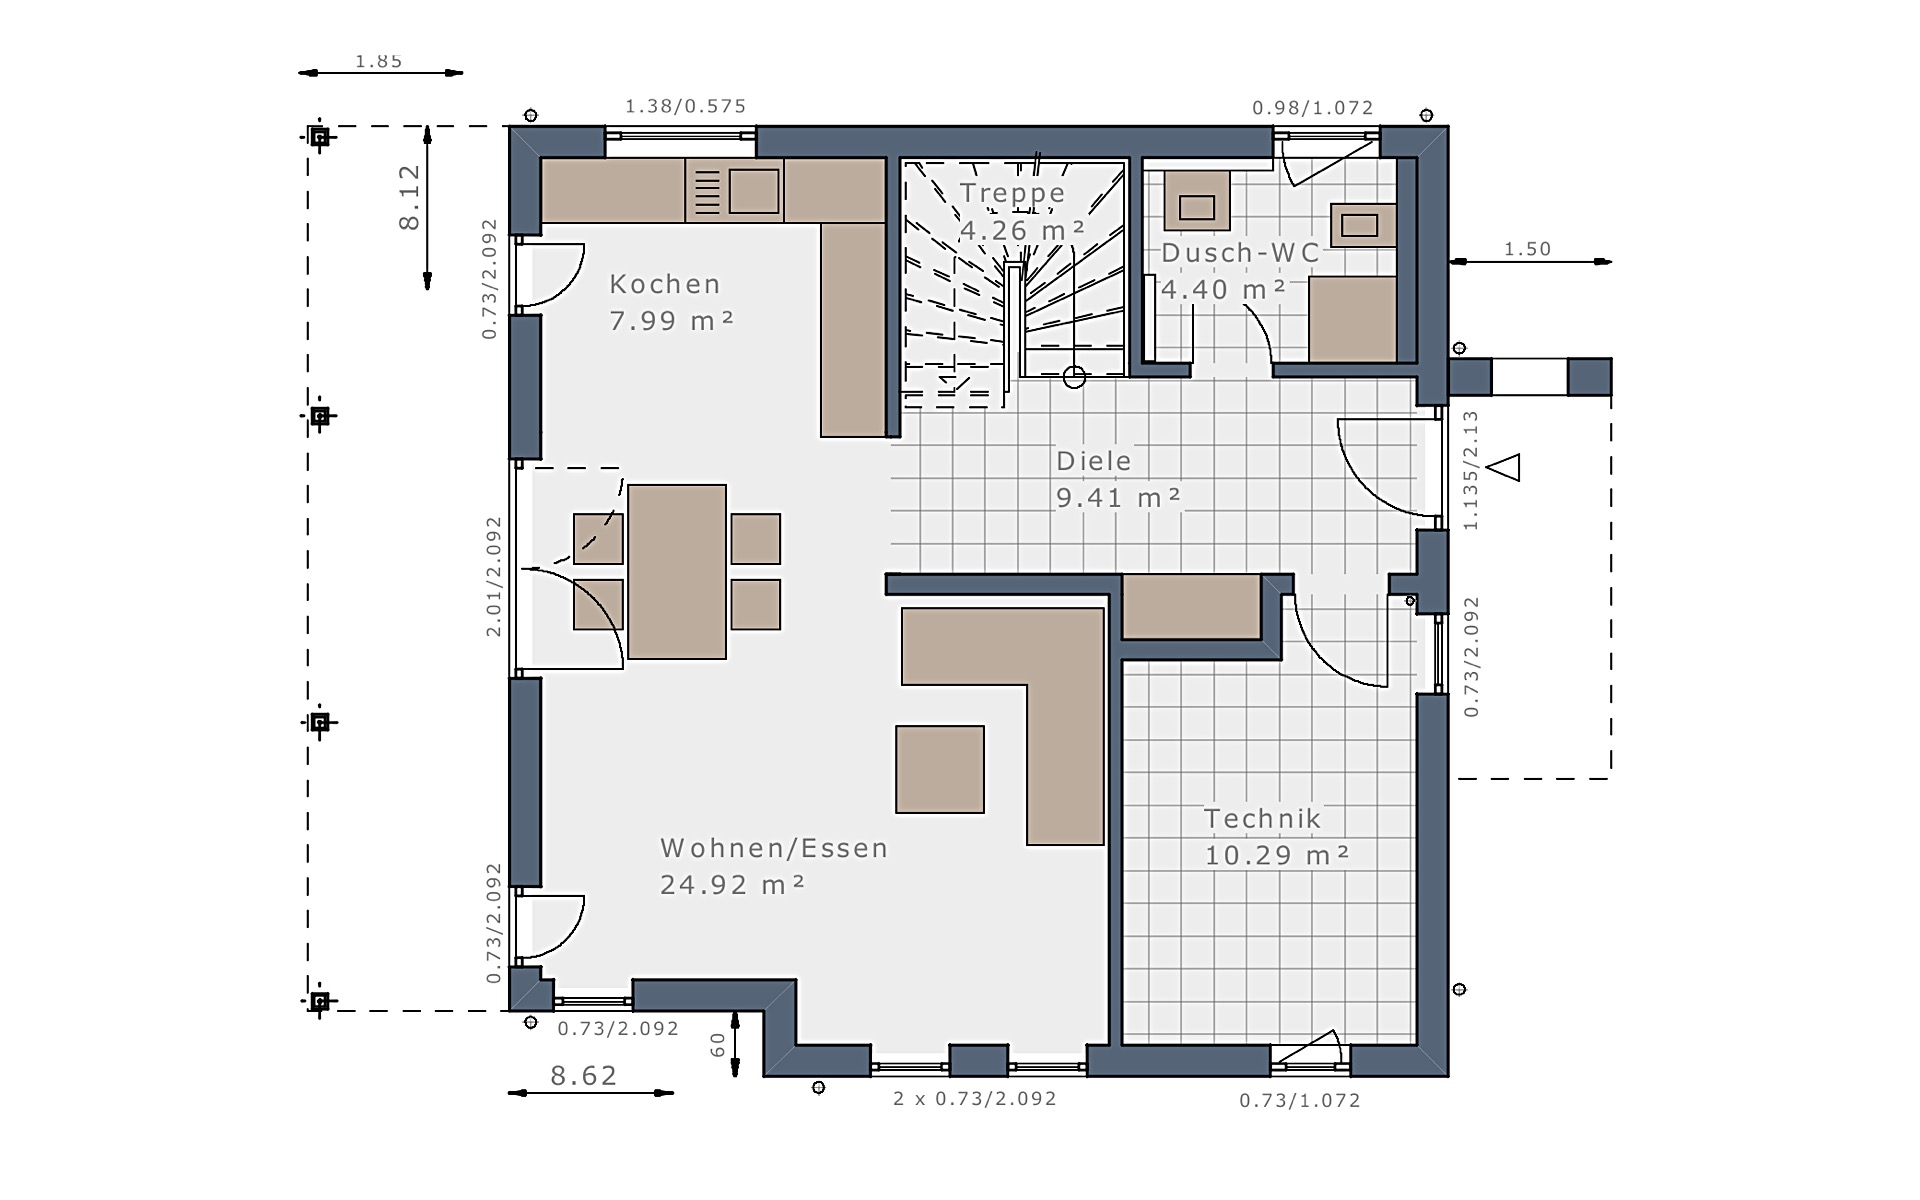 Erdgeschoss Solitaire-E-115 E7 von Schwabenhaus GmbH & Co. KG